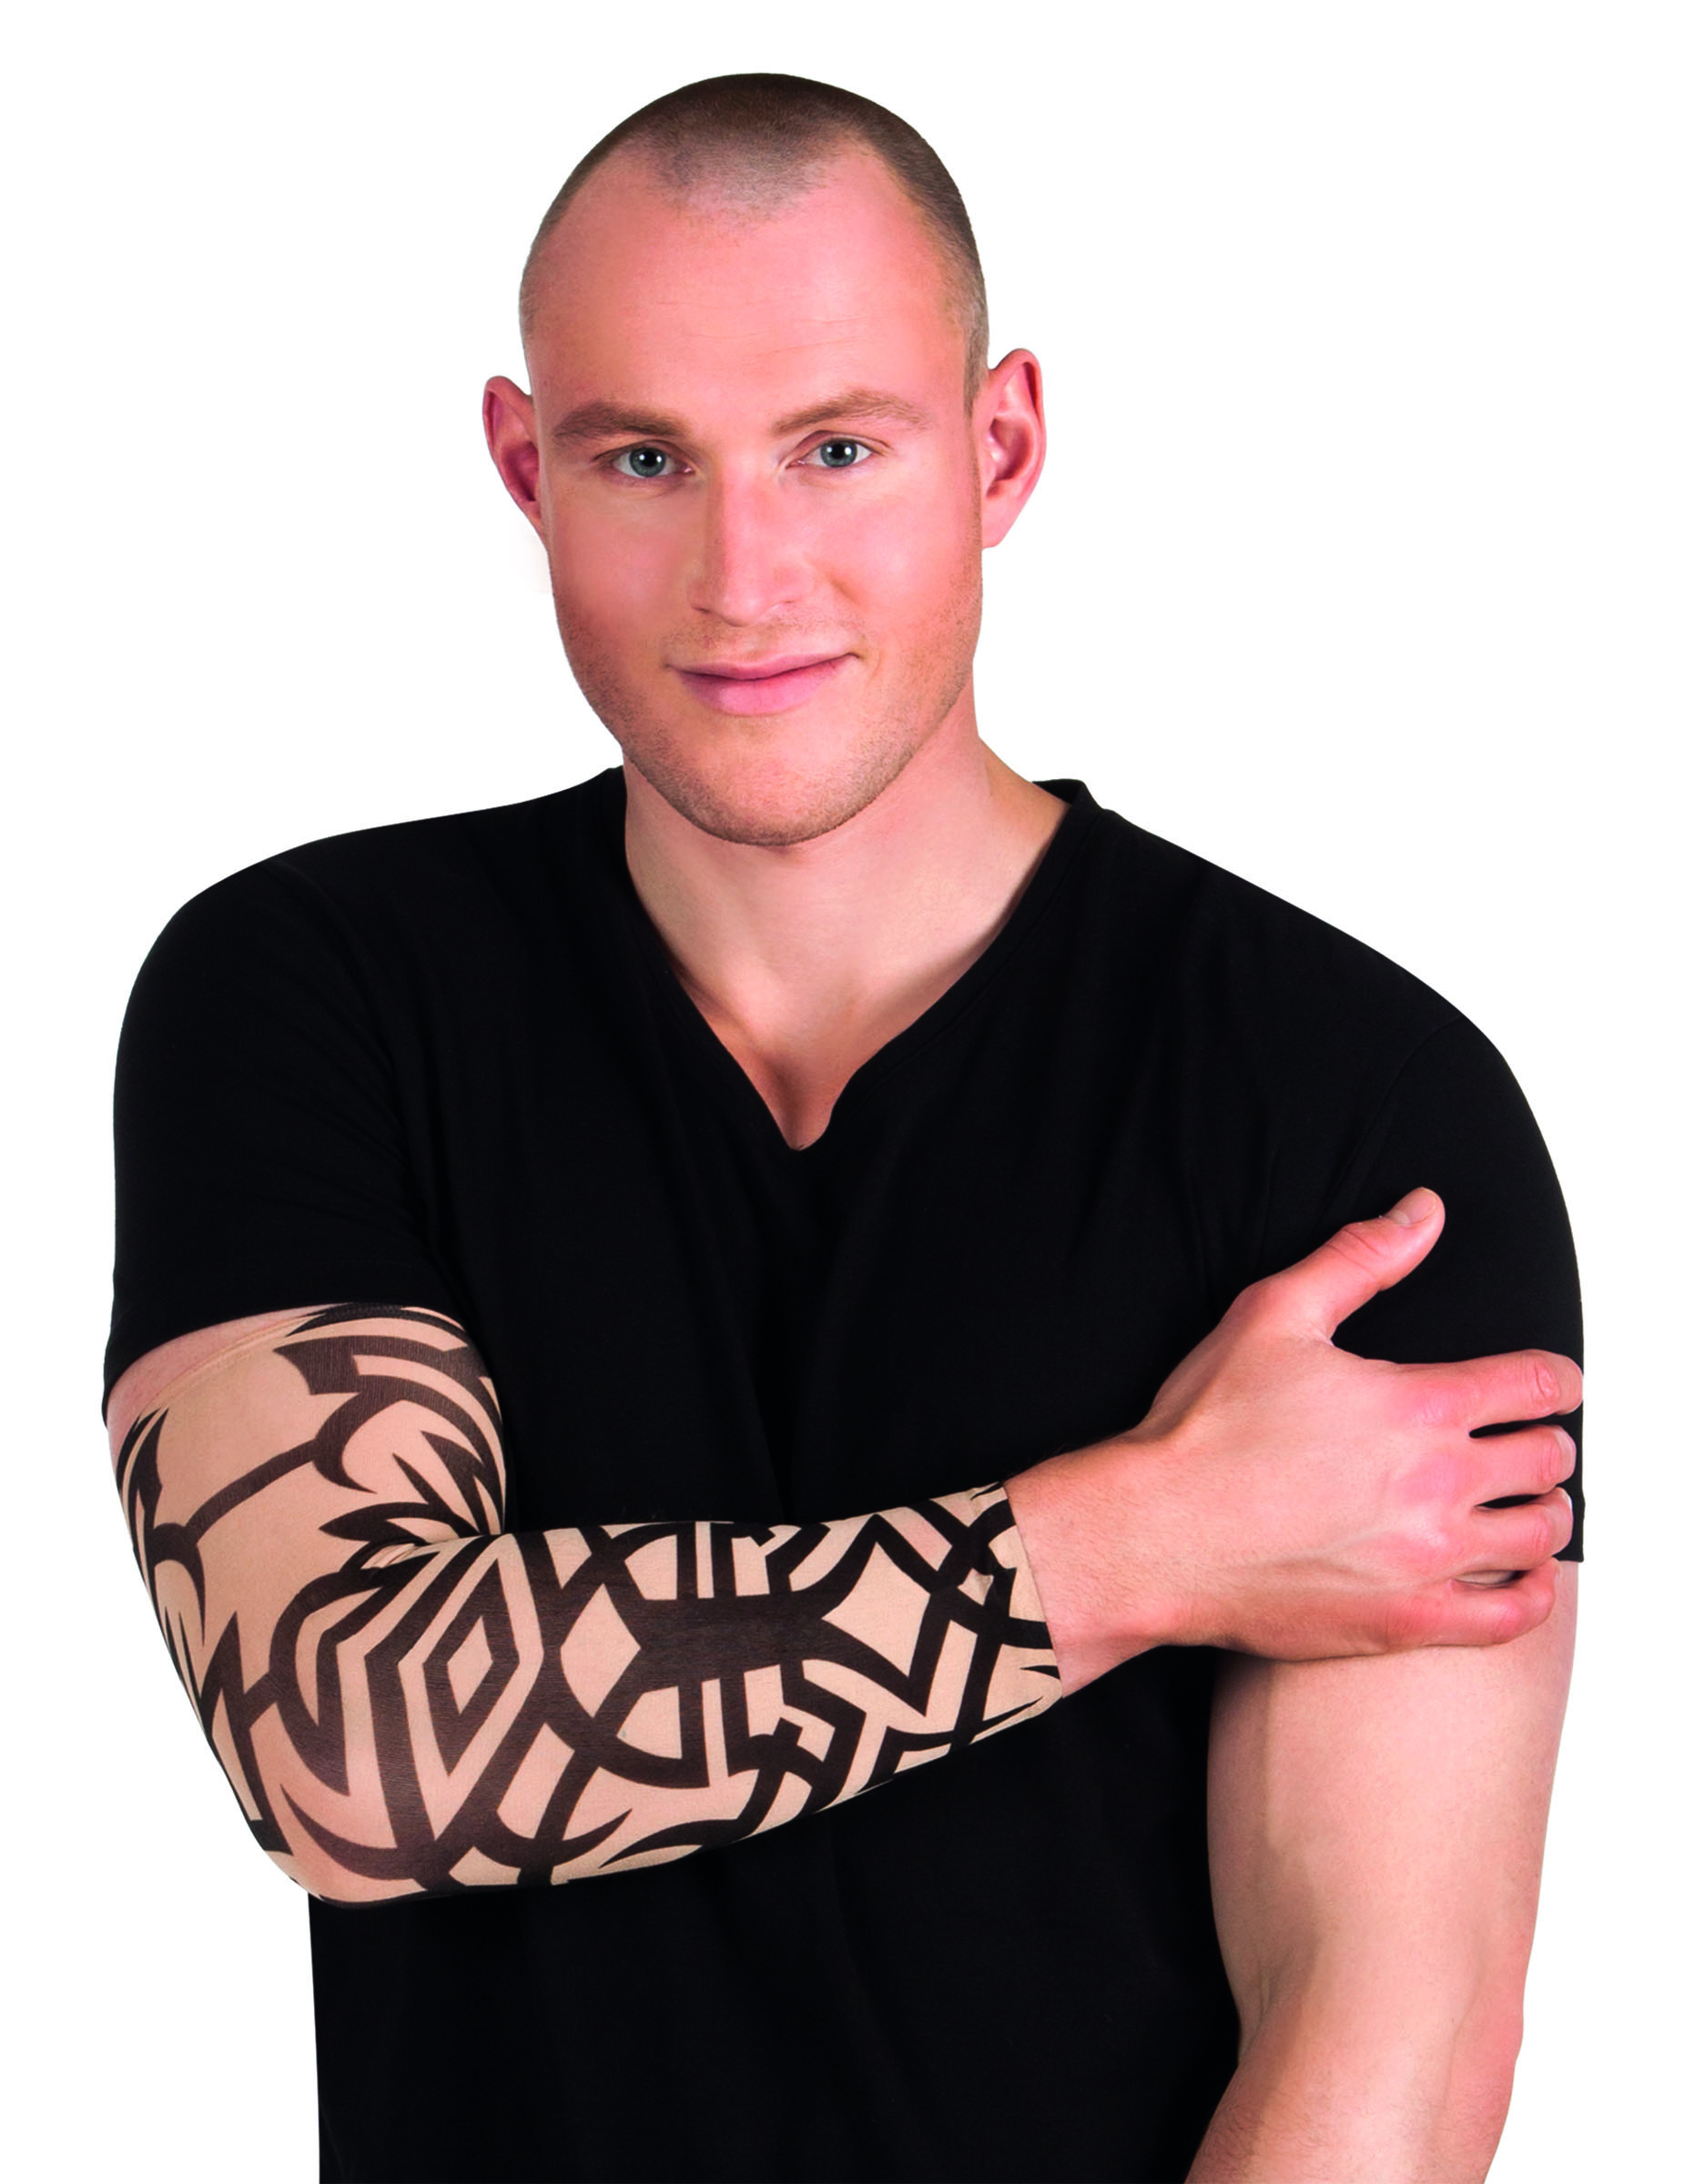 tattoo rmel tribals g nstige faschings accessoires. Black Bedroom Furniture Sets. Home Design Ideas